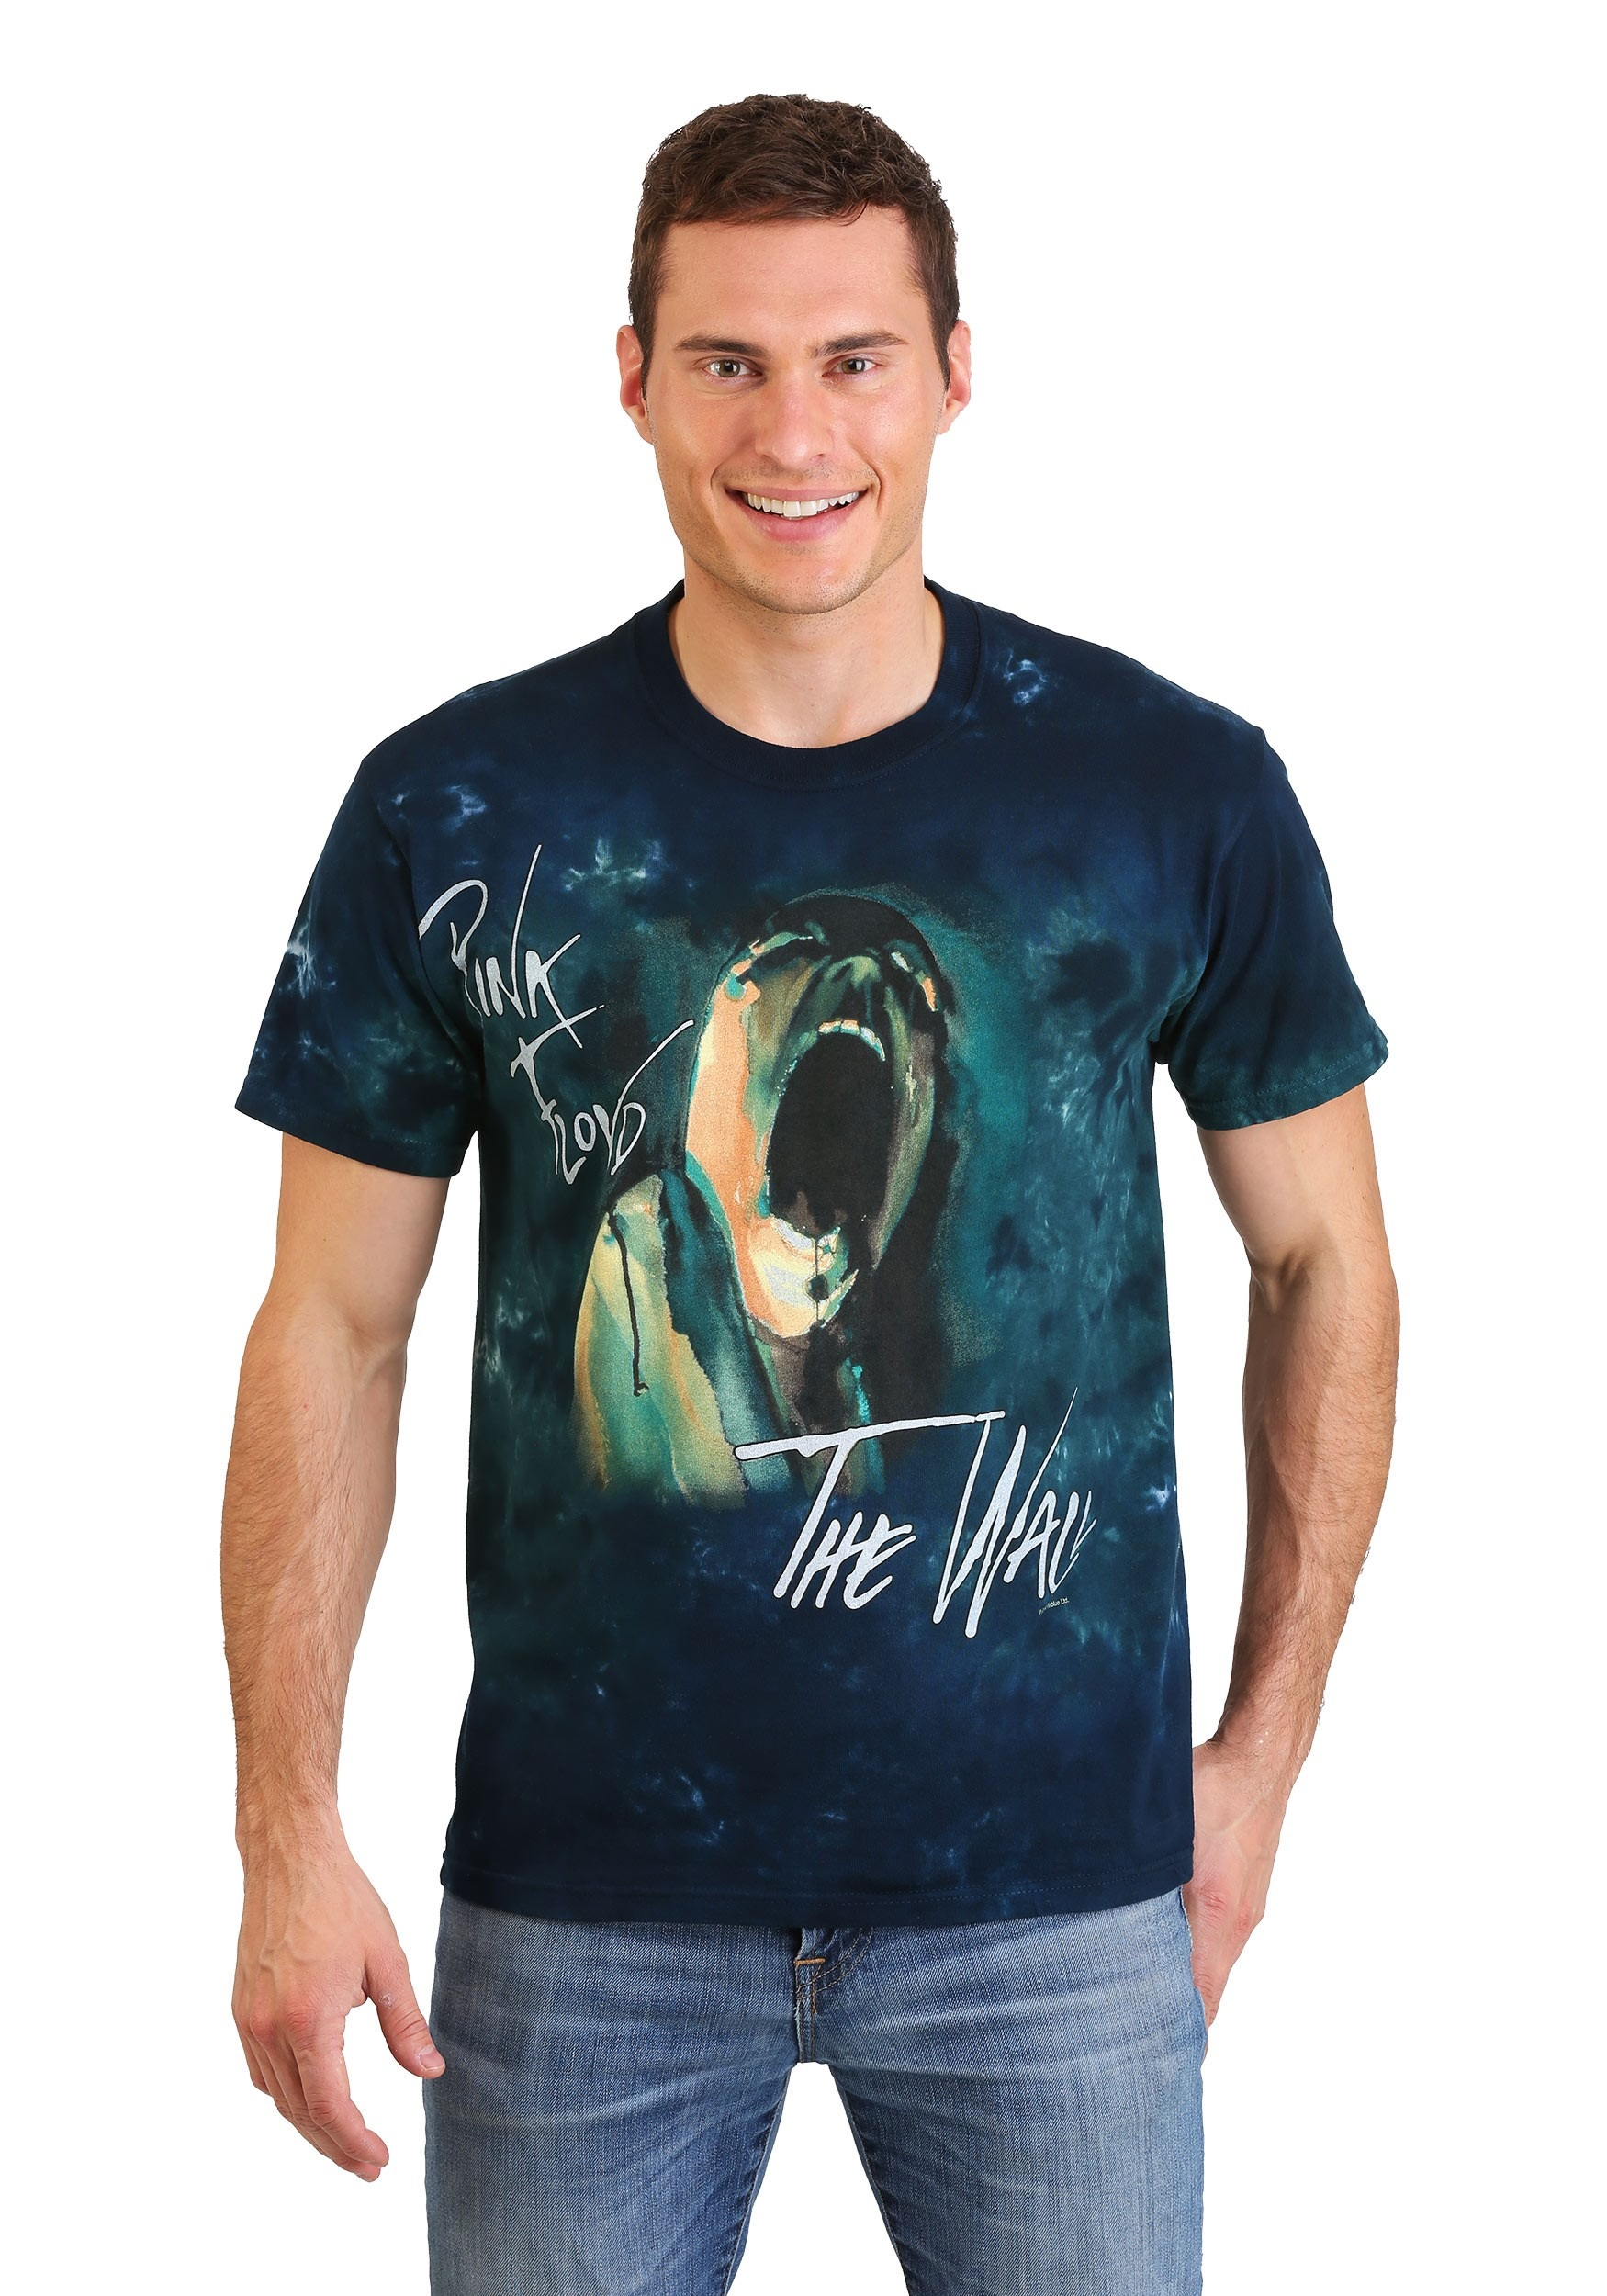 Men's Pink Floyd The Wall Screaming Face Tie-Dye T-Shirt